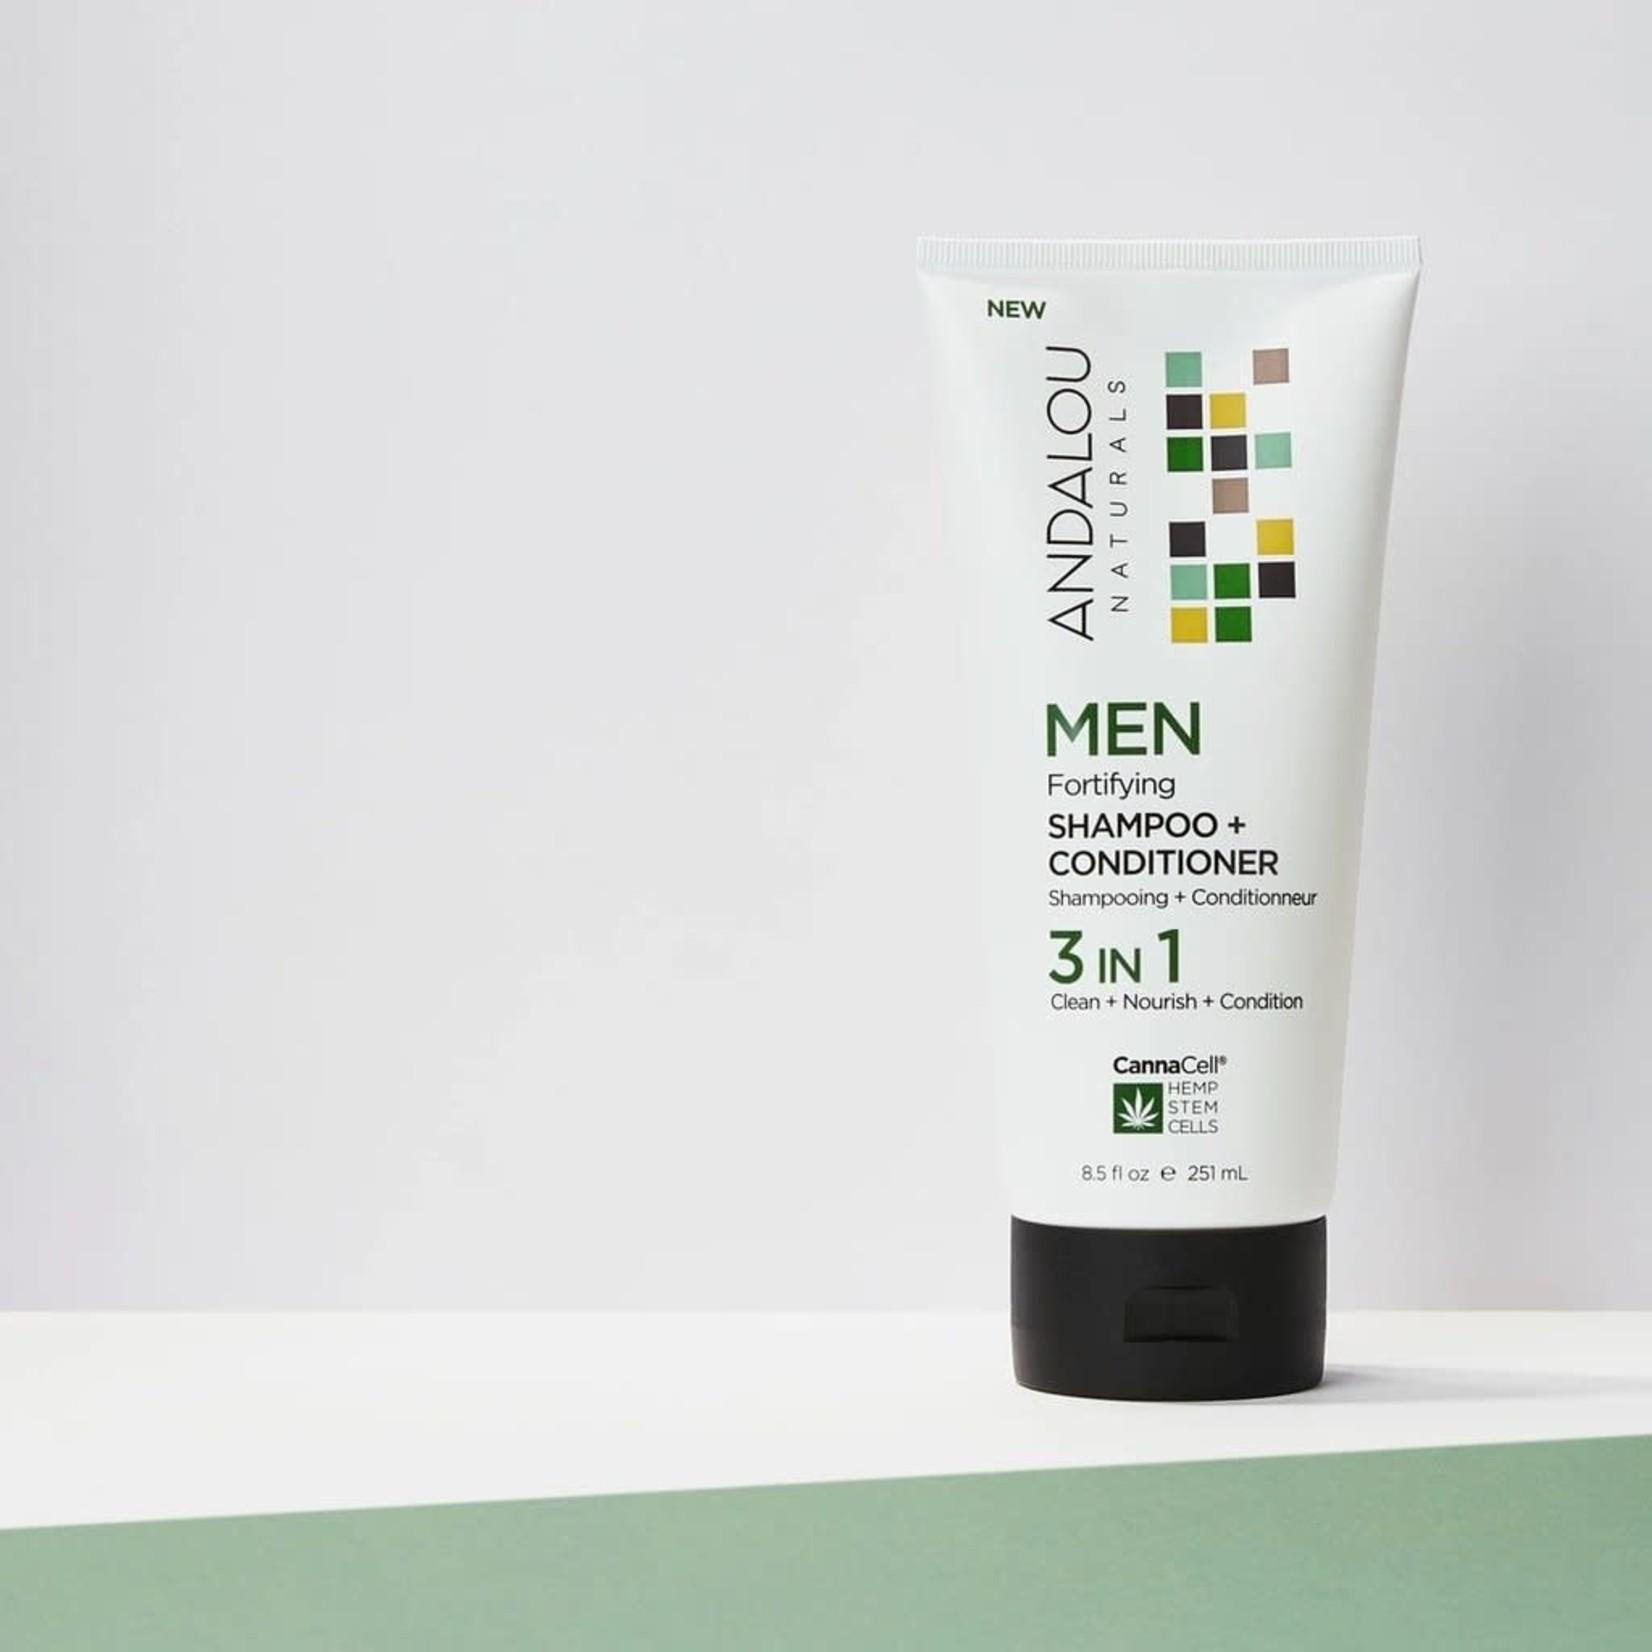 Andalou Andalou Men 3 in 1 Shampoo + Conditioner 251ml